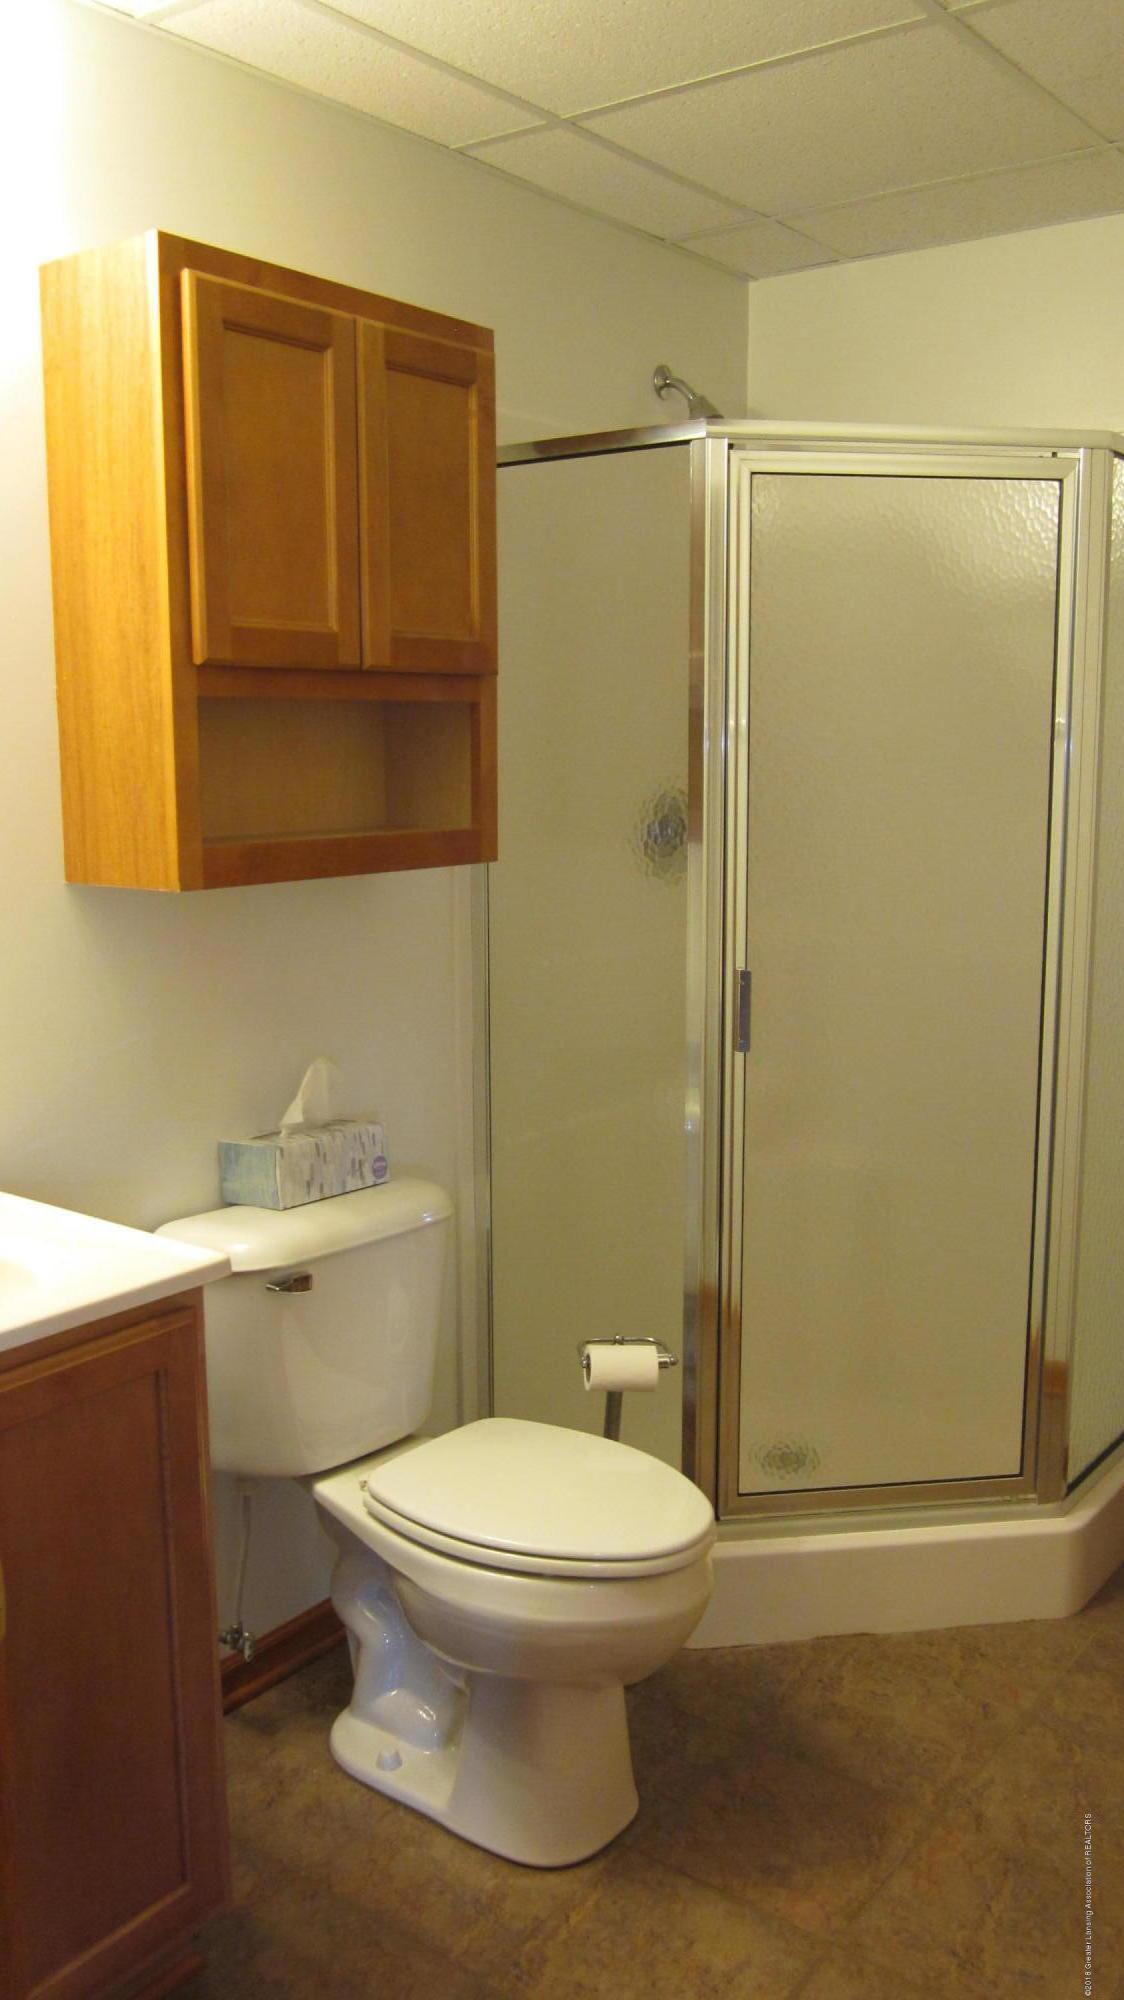 5384 S Stine Rd - Basement bath - 34